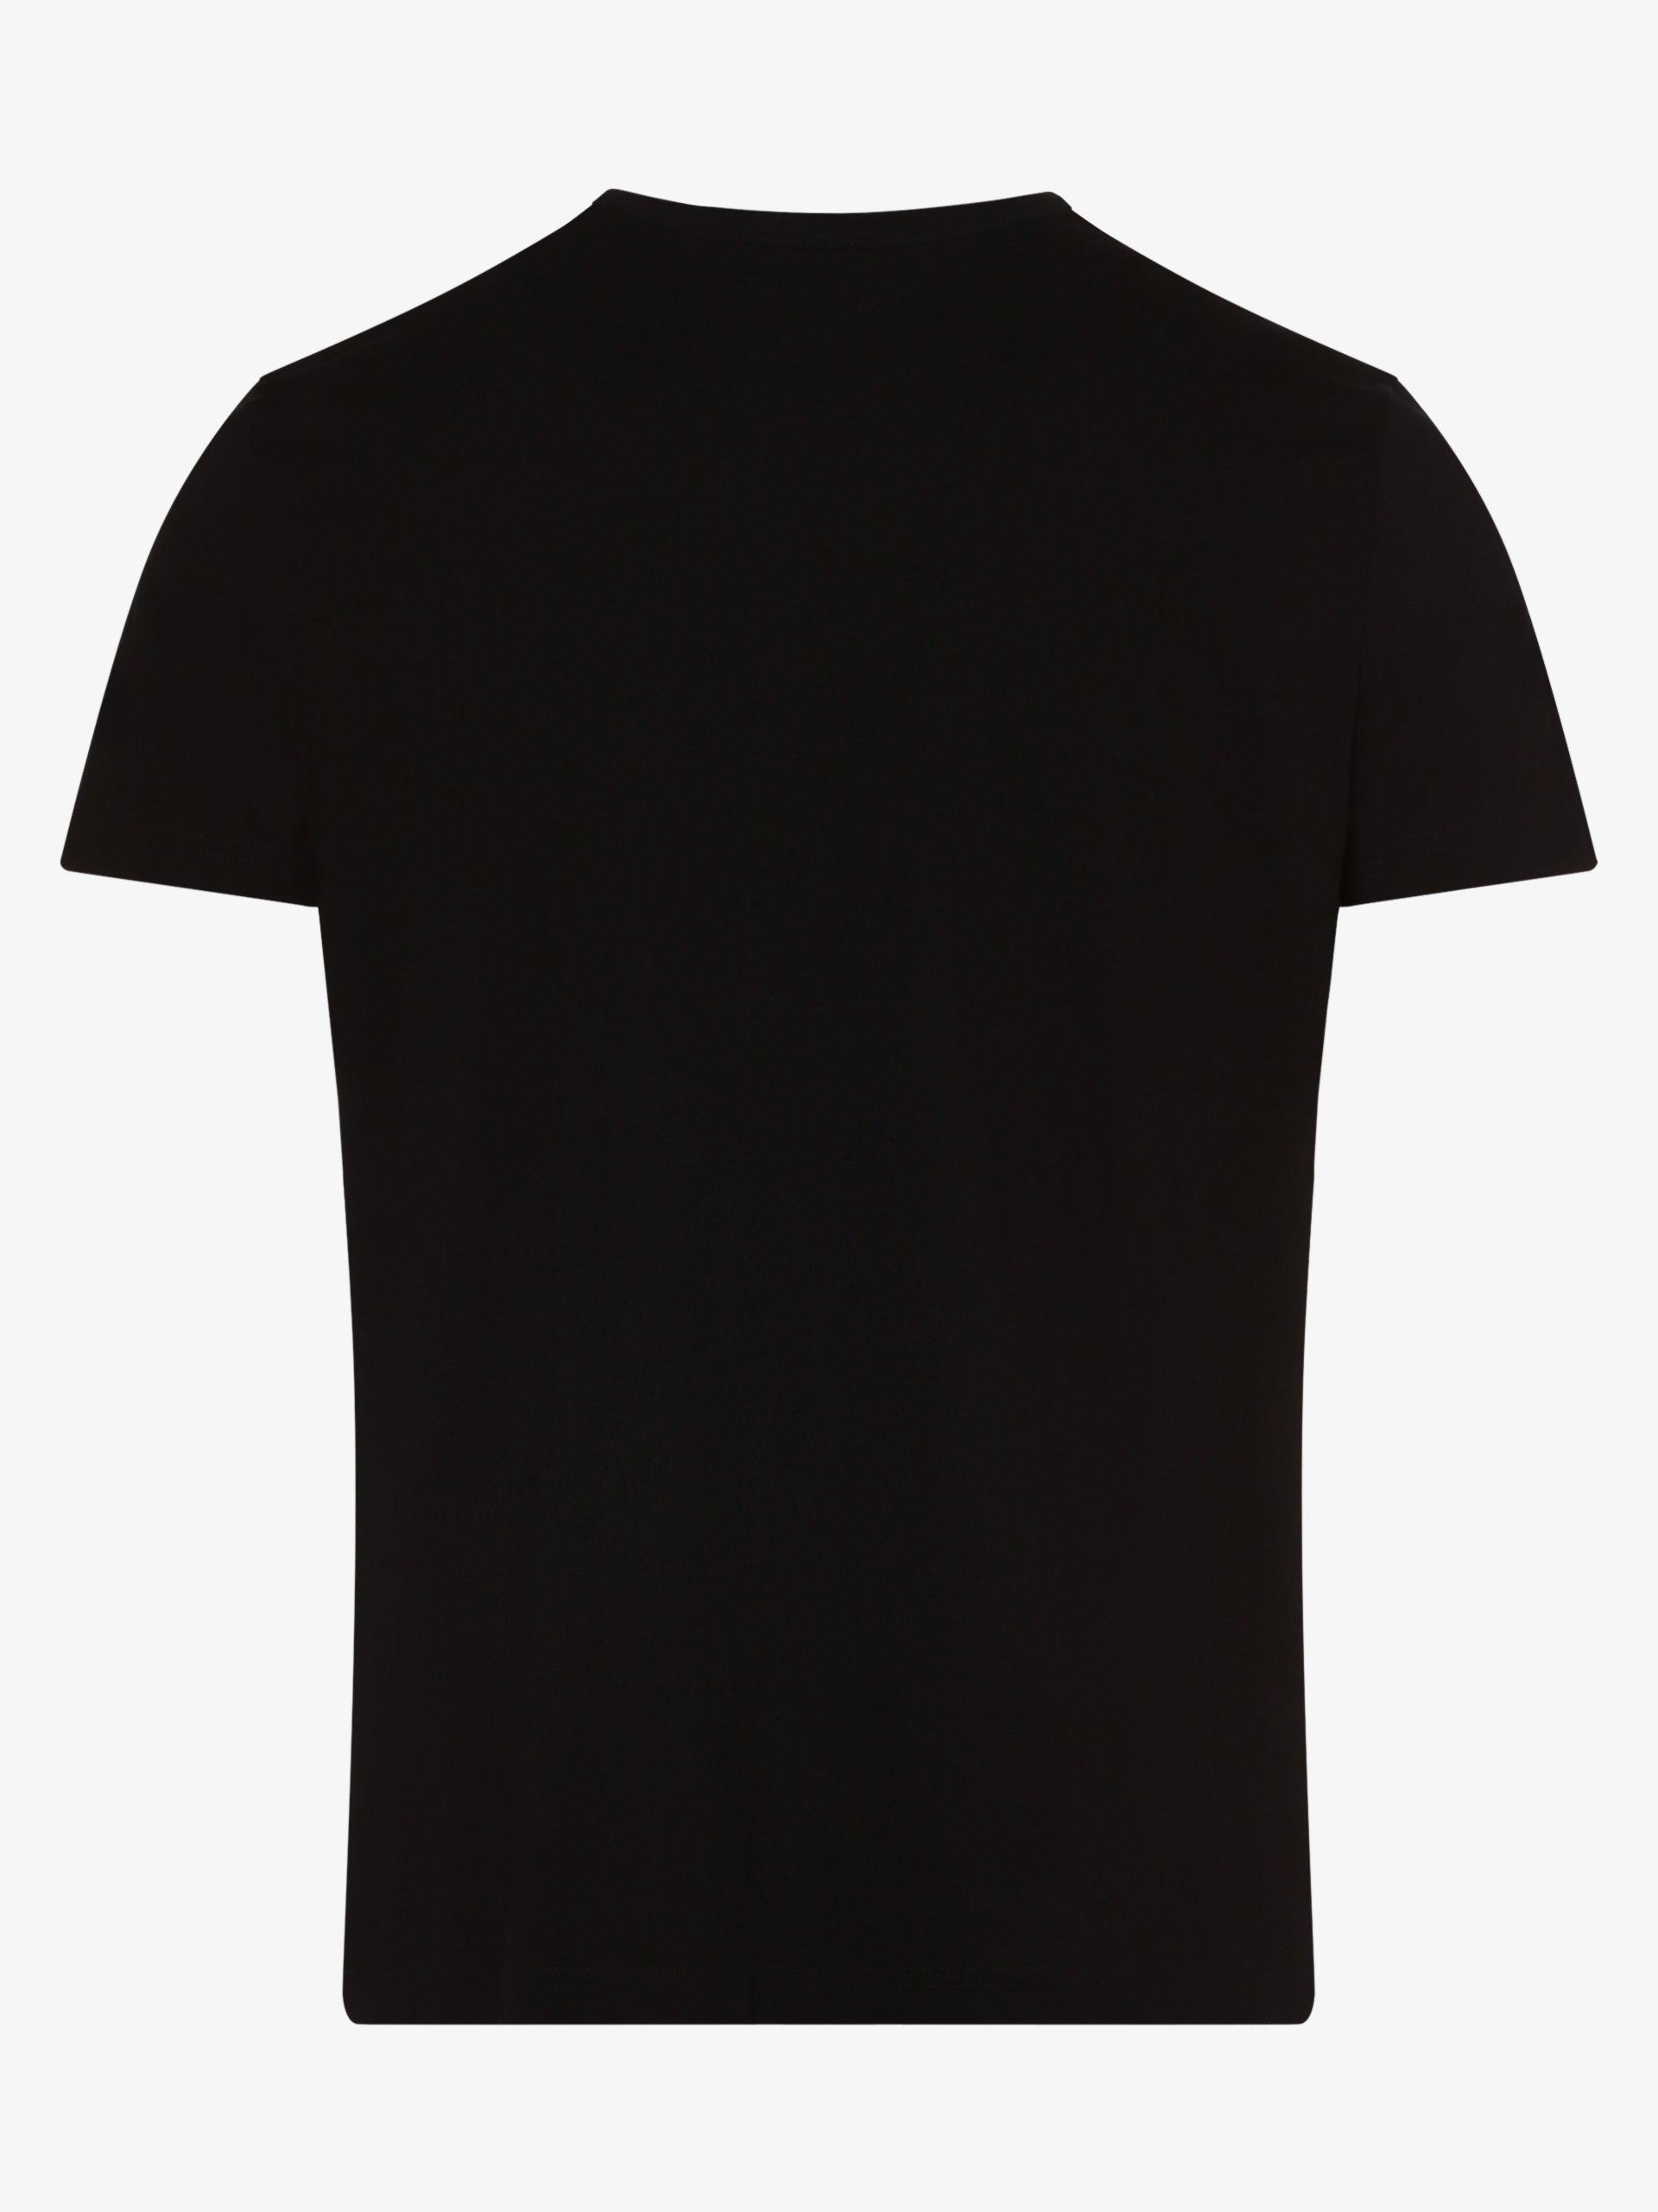 BOSS Athleisure T-shirt męski – Tee Curved